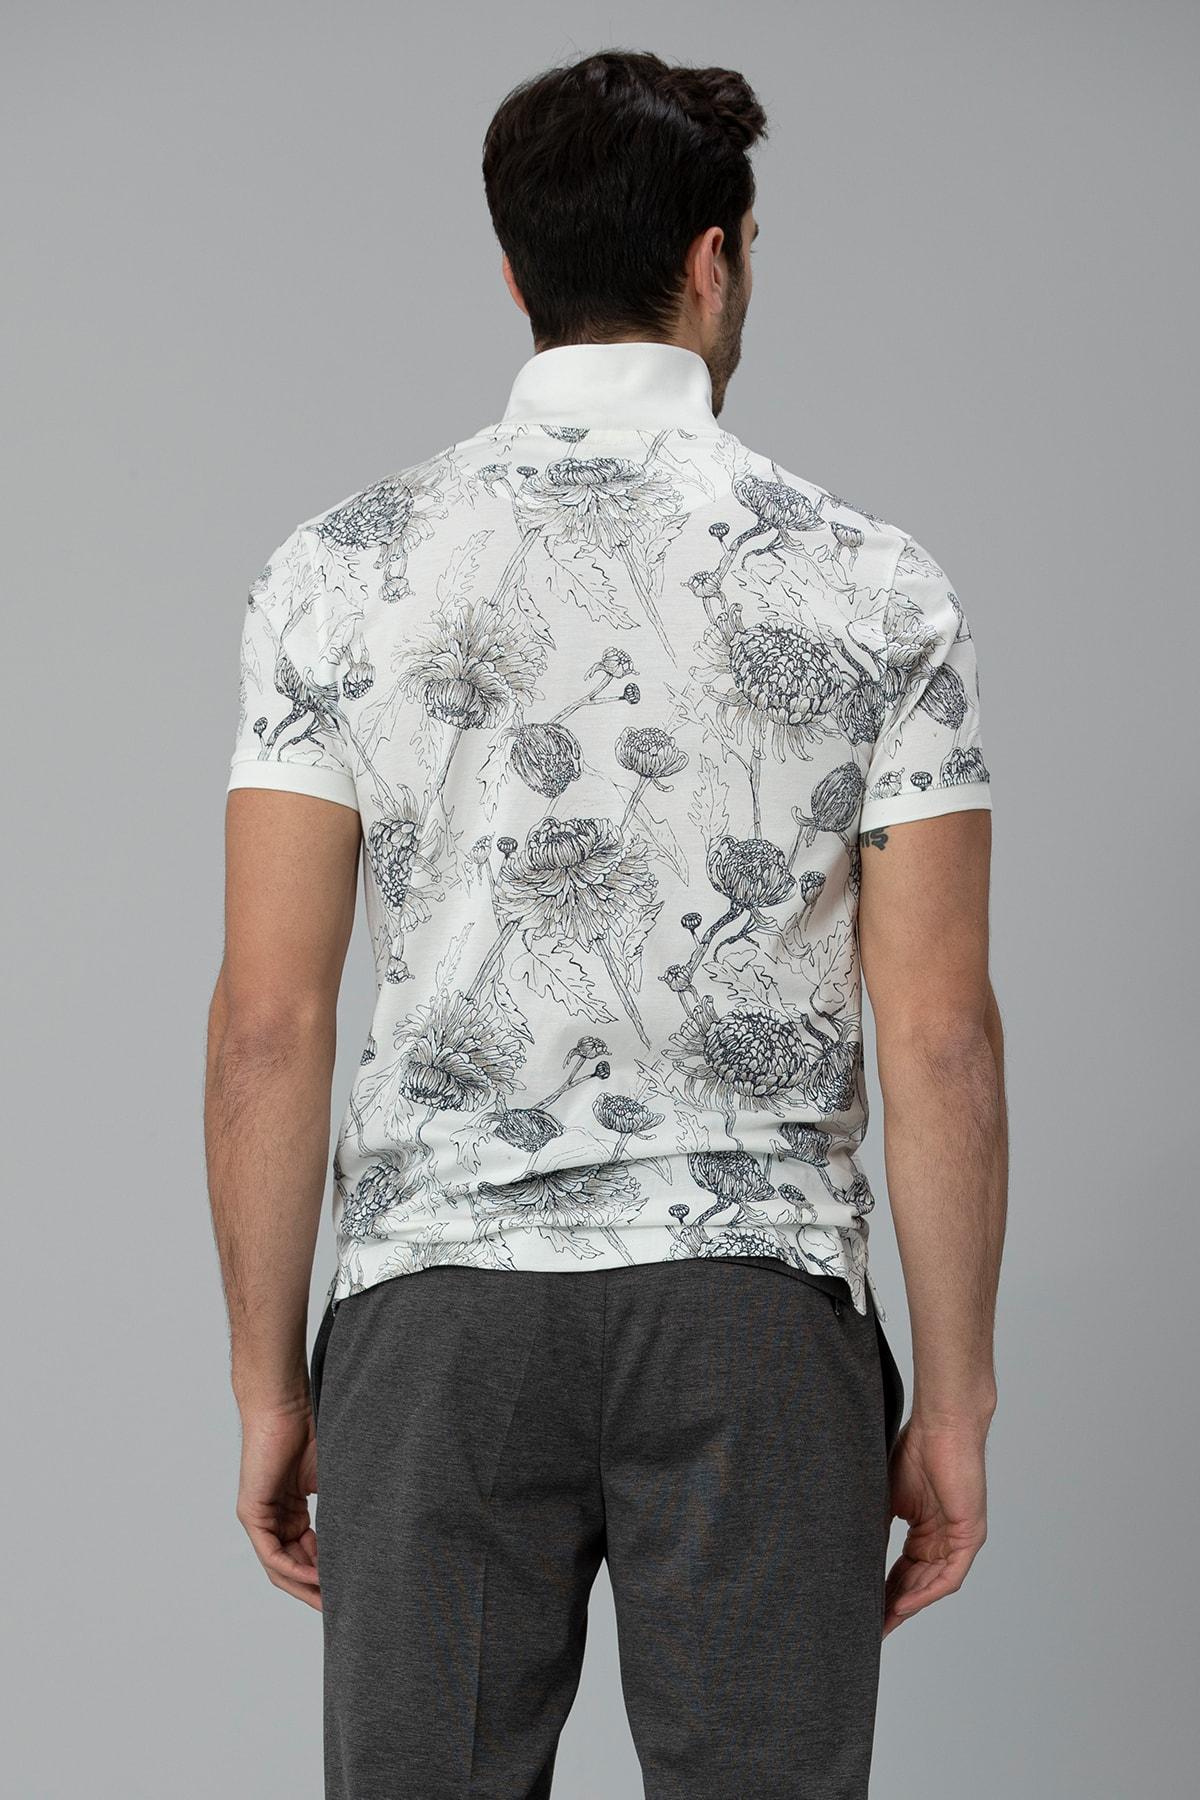 Lufian Capri Spor Polo T- Shirt Kırık Beyaz 3